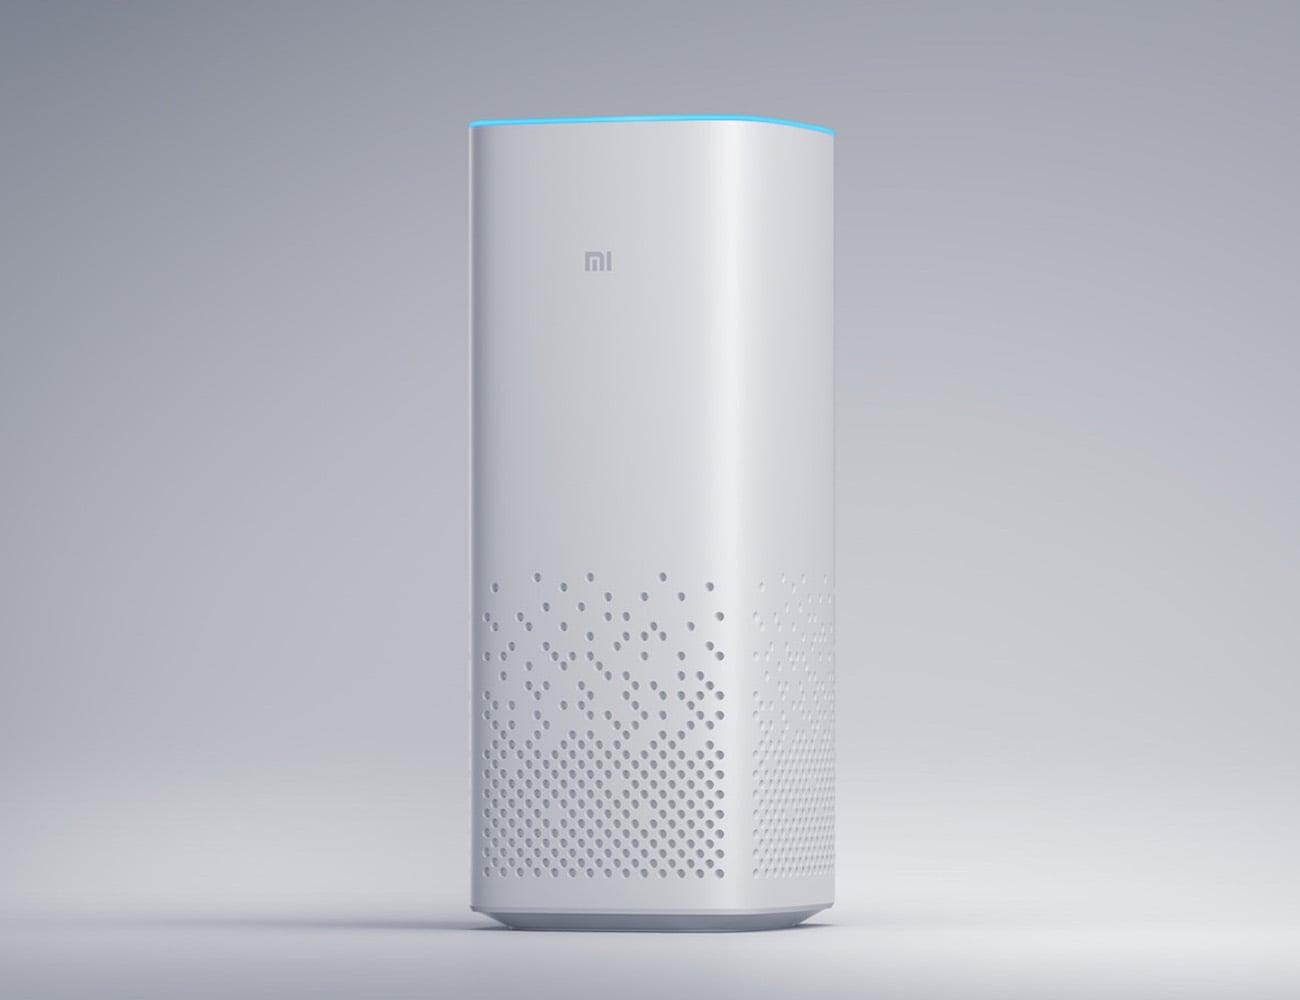 Xiaomi Mi AI Affordable Smart Speaker